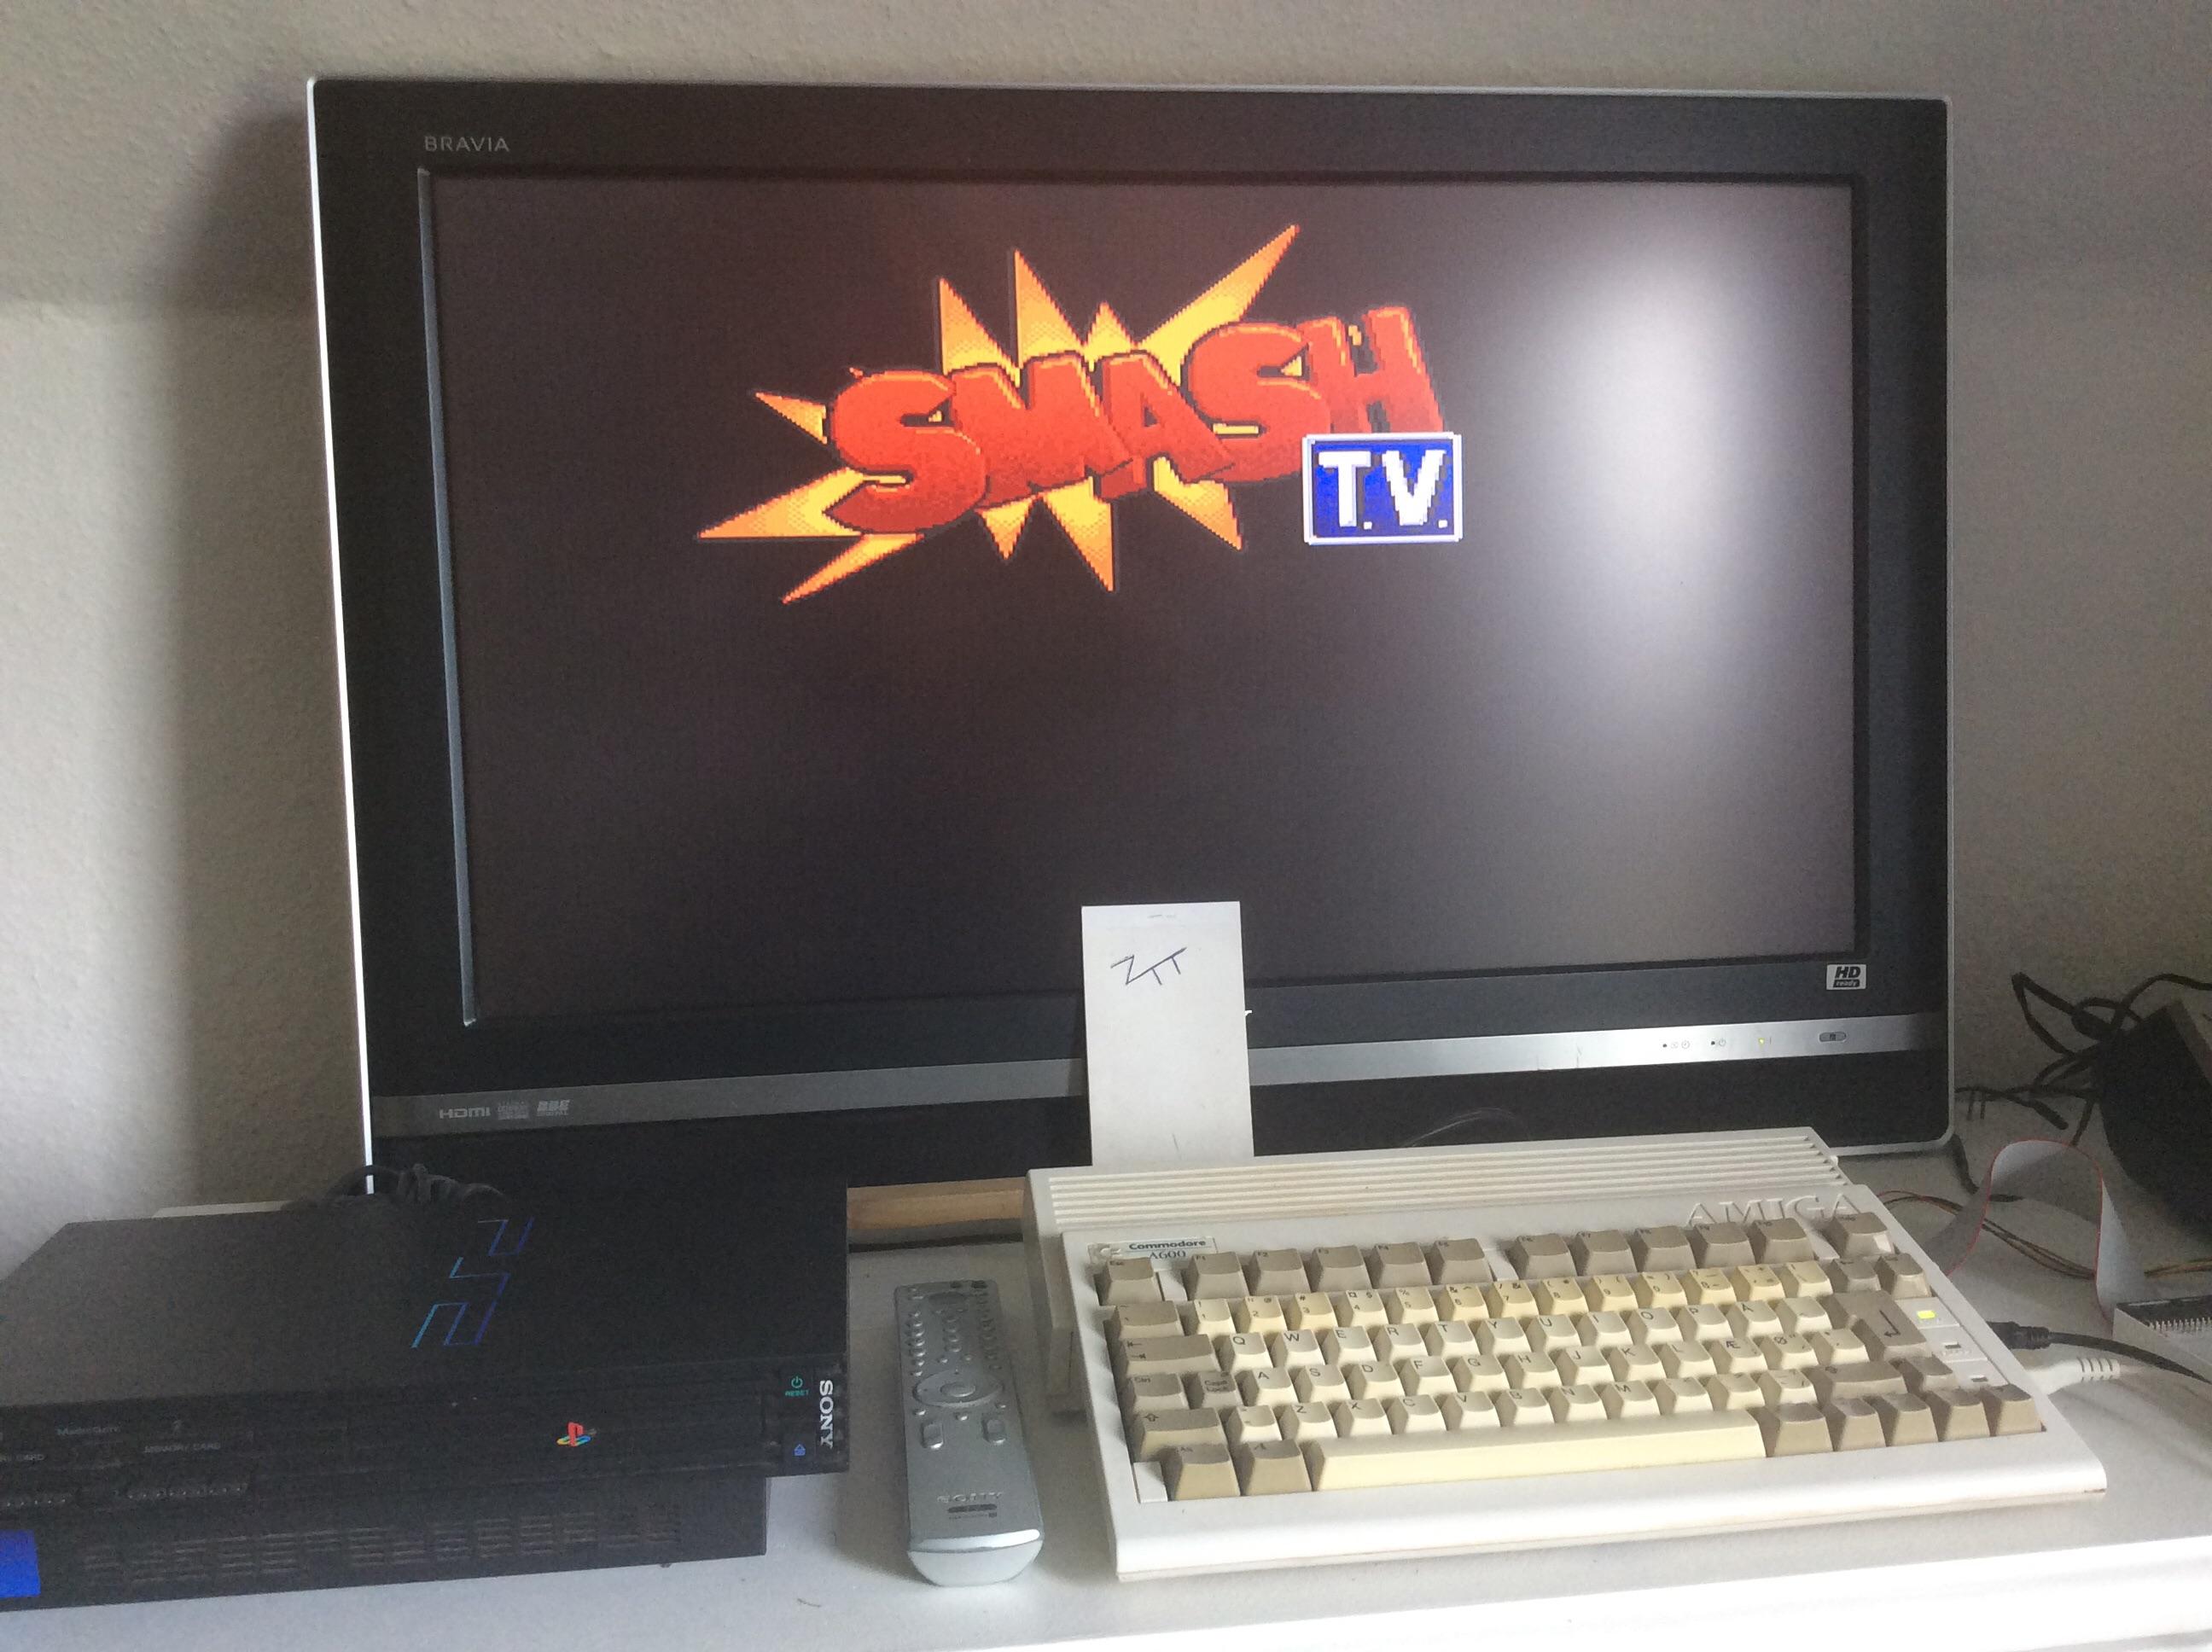 Frankie: Smash TV (Amiga) 629,680 points on 2016-10-29 06:56:27